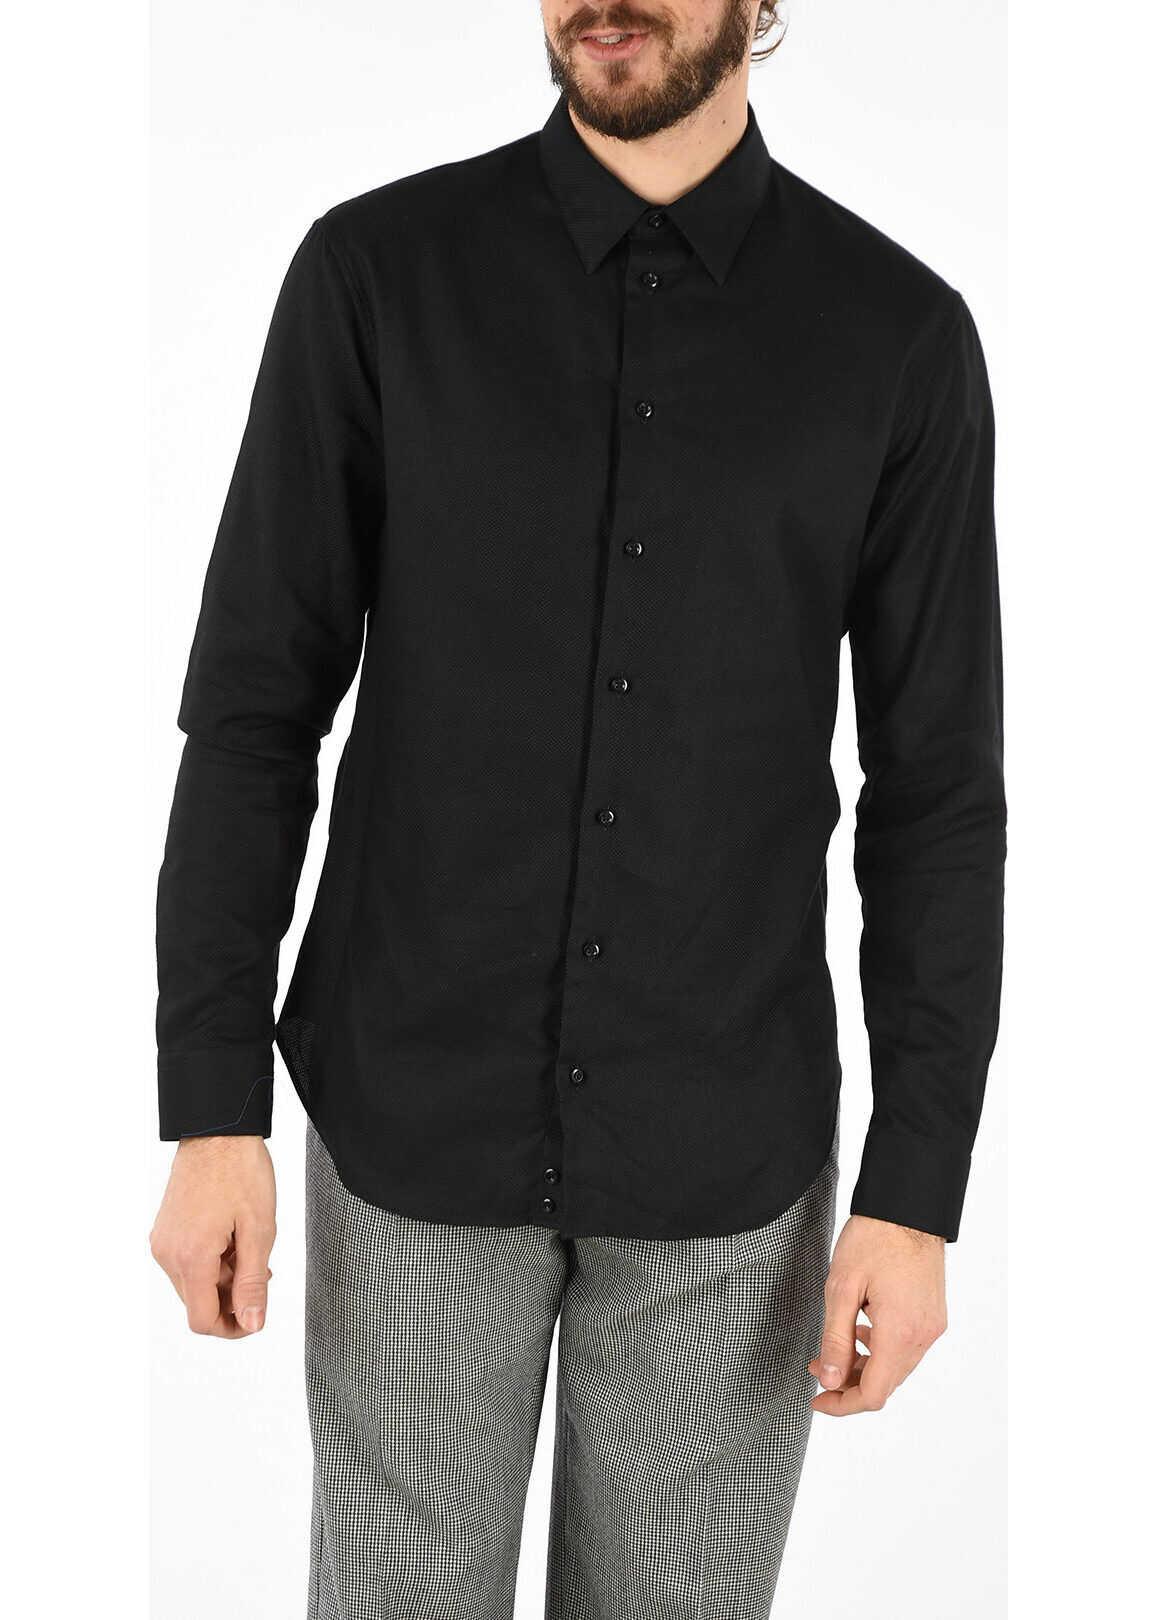 Armani EMPORIO Cotton Popeline Shirt BLACK